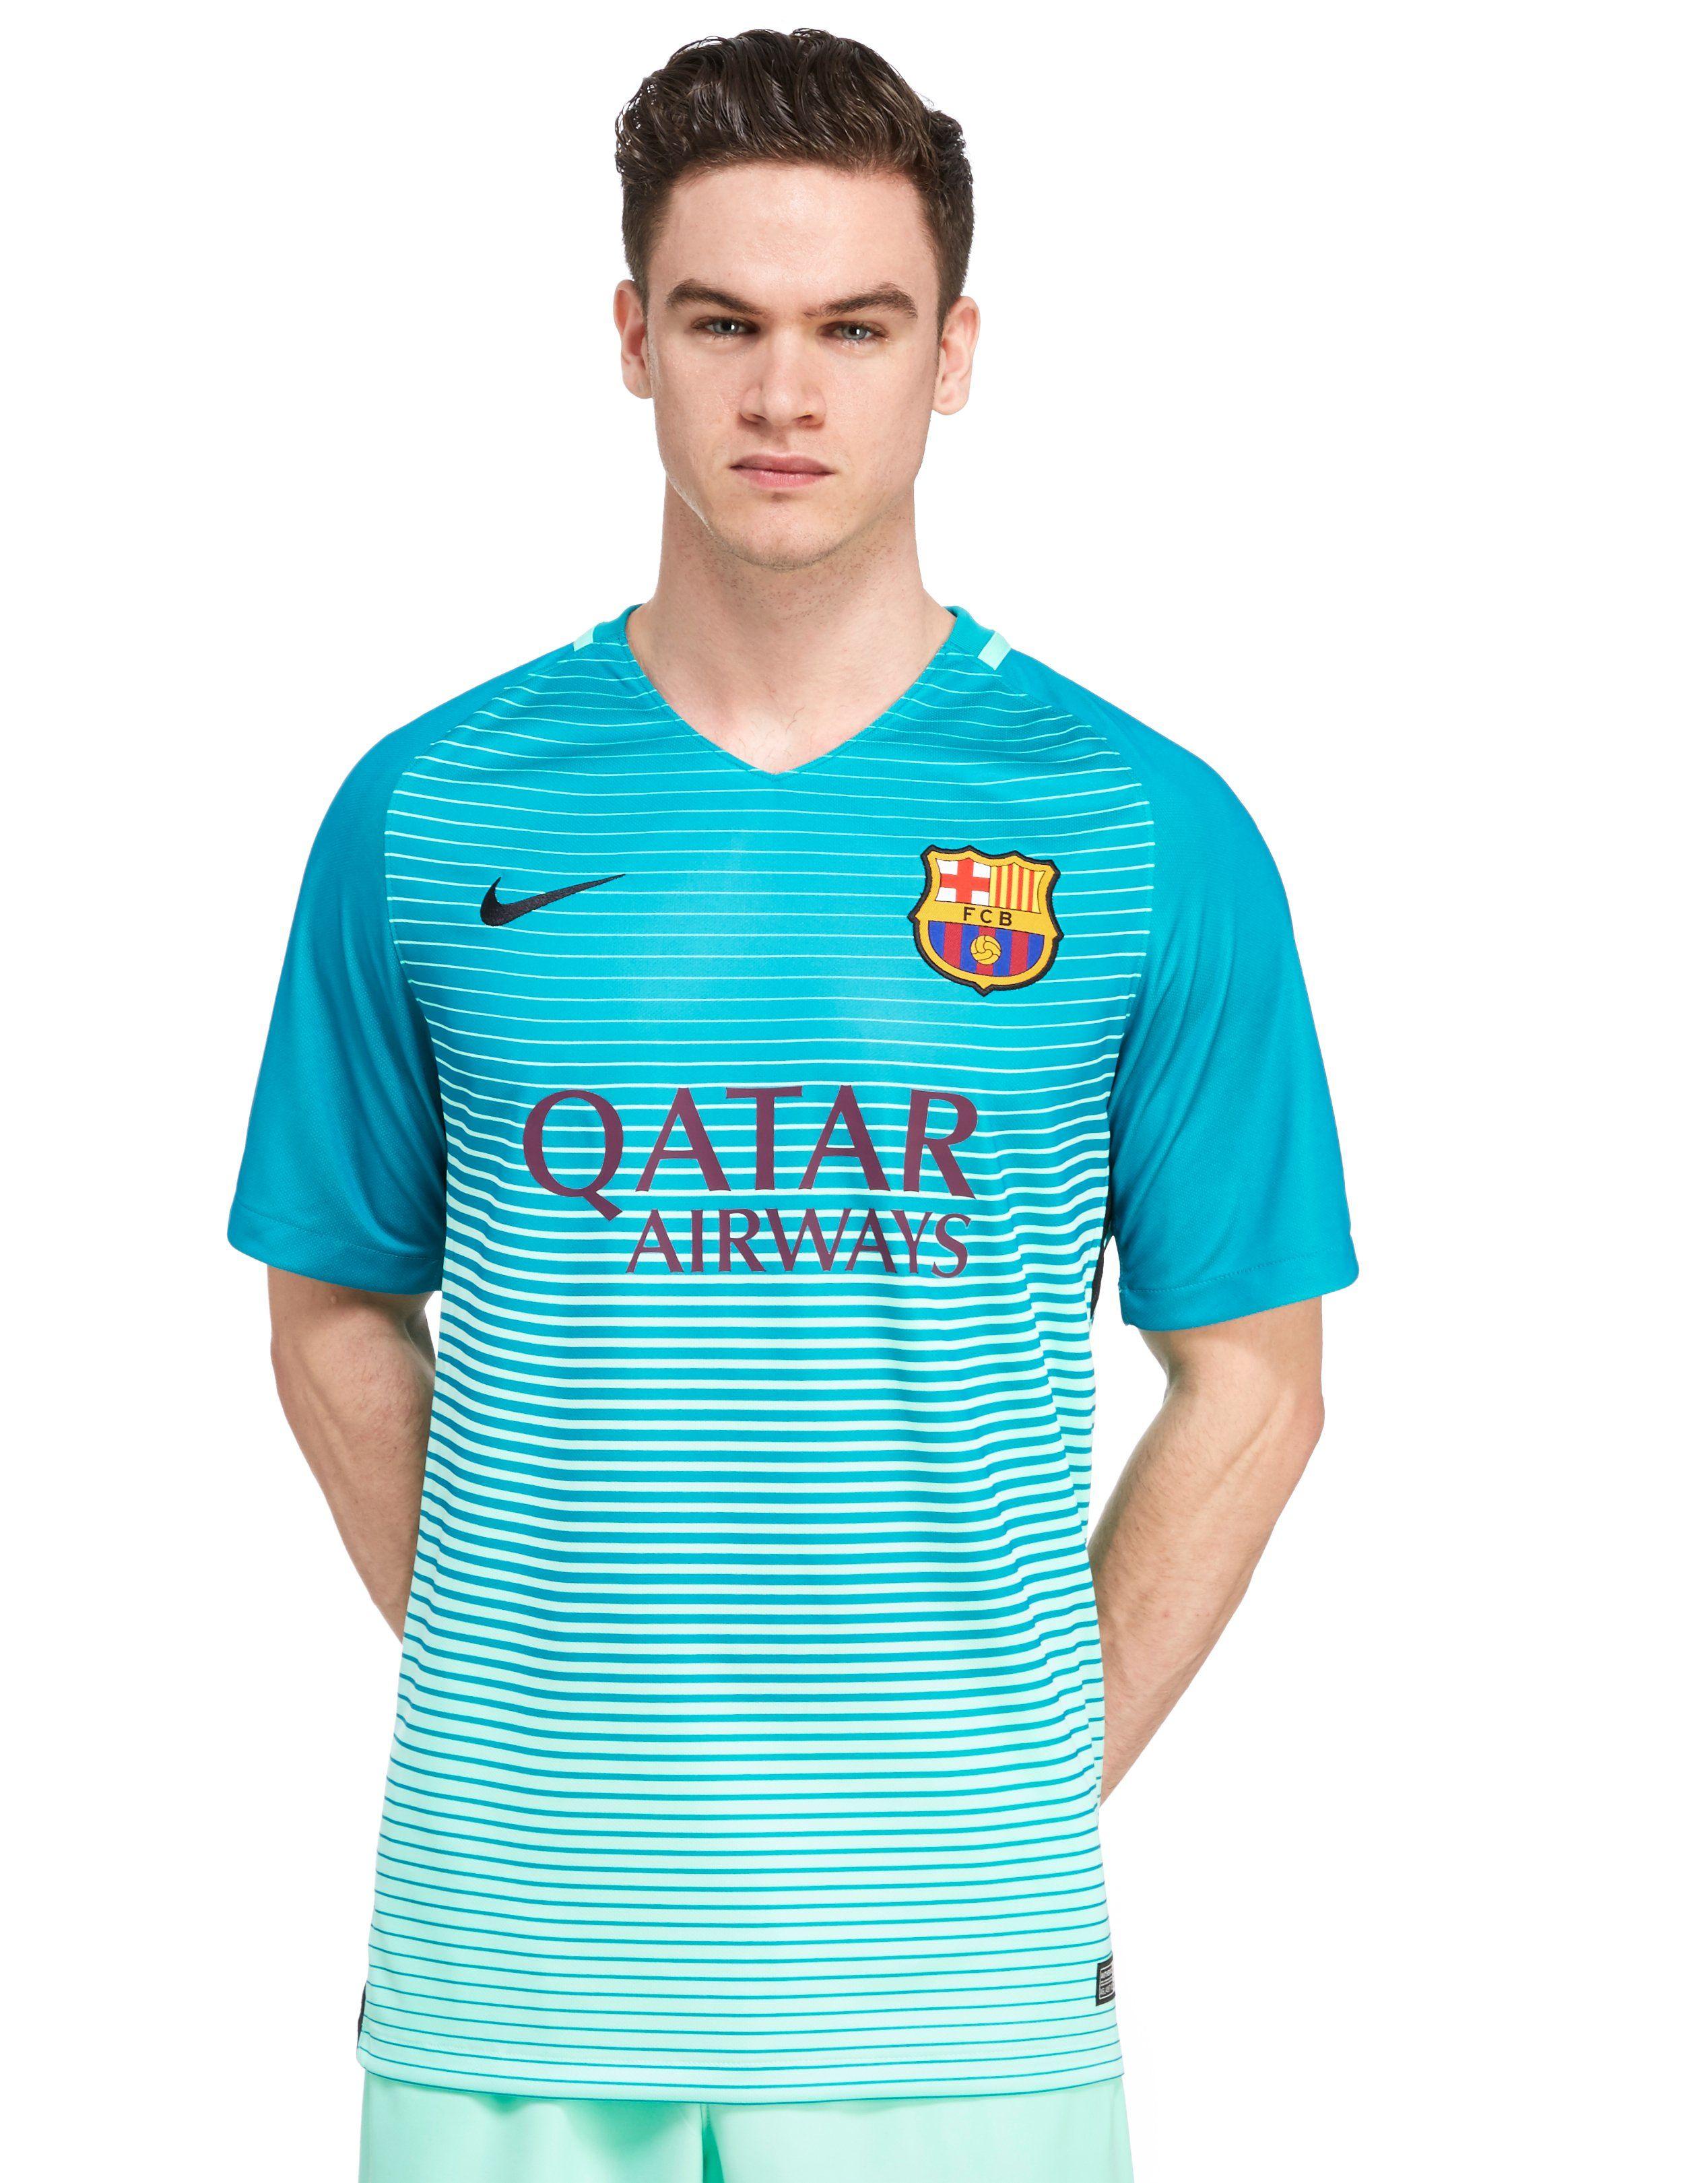 09c7bae65935a hot sale 2017 Nike FC Barcelona 2016/17 Third Shirt   JD Sports ...